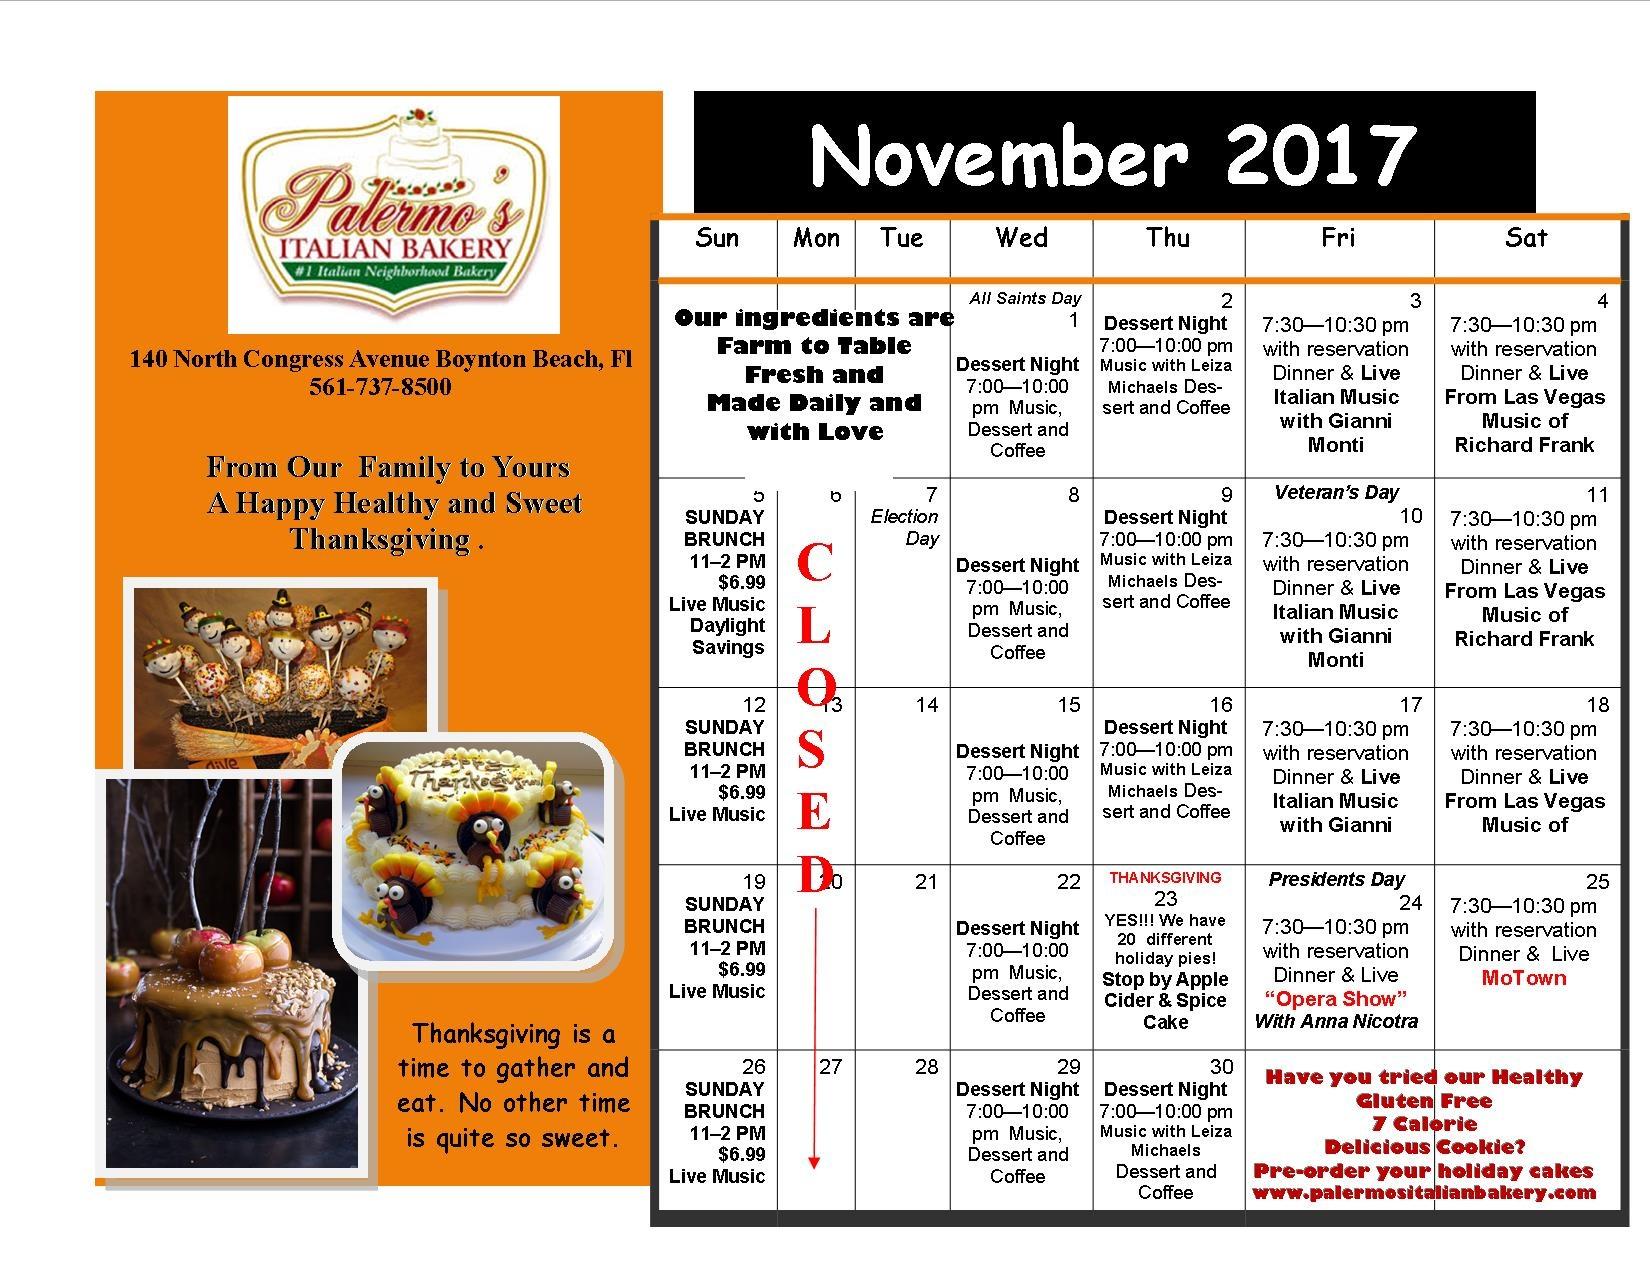 November Performance Schedule